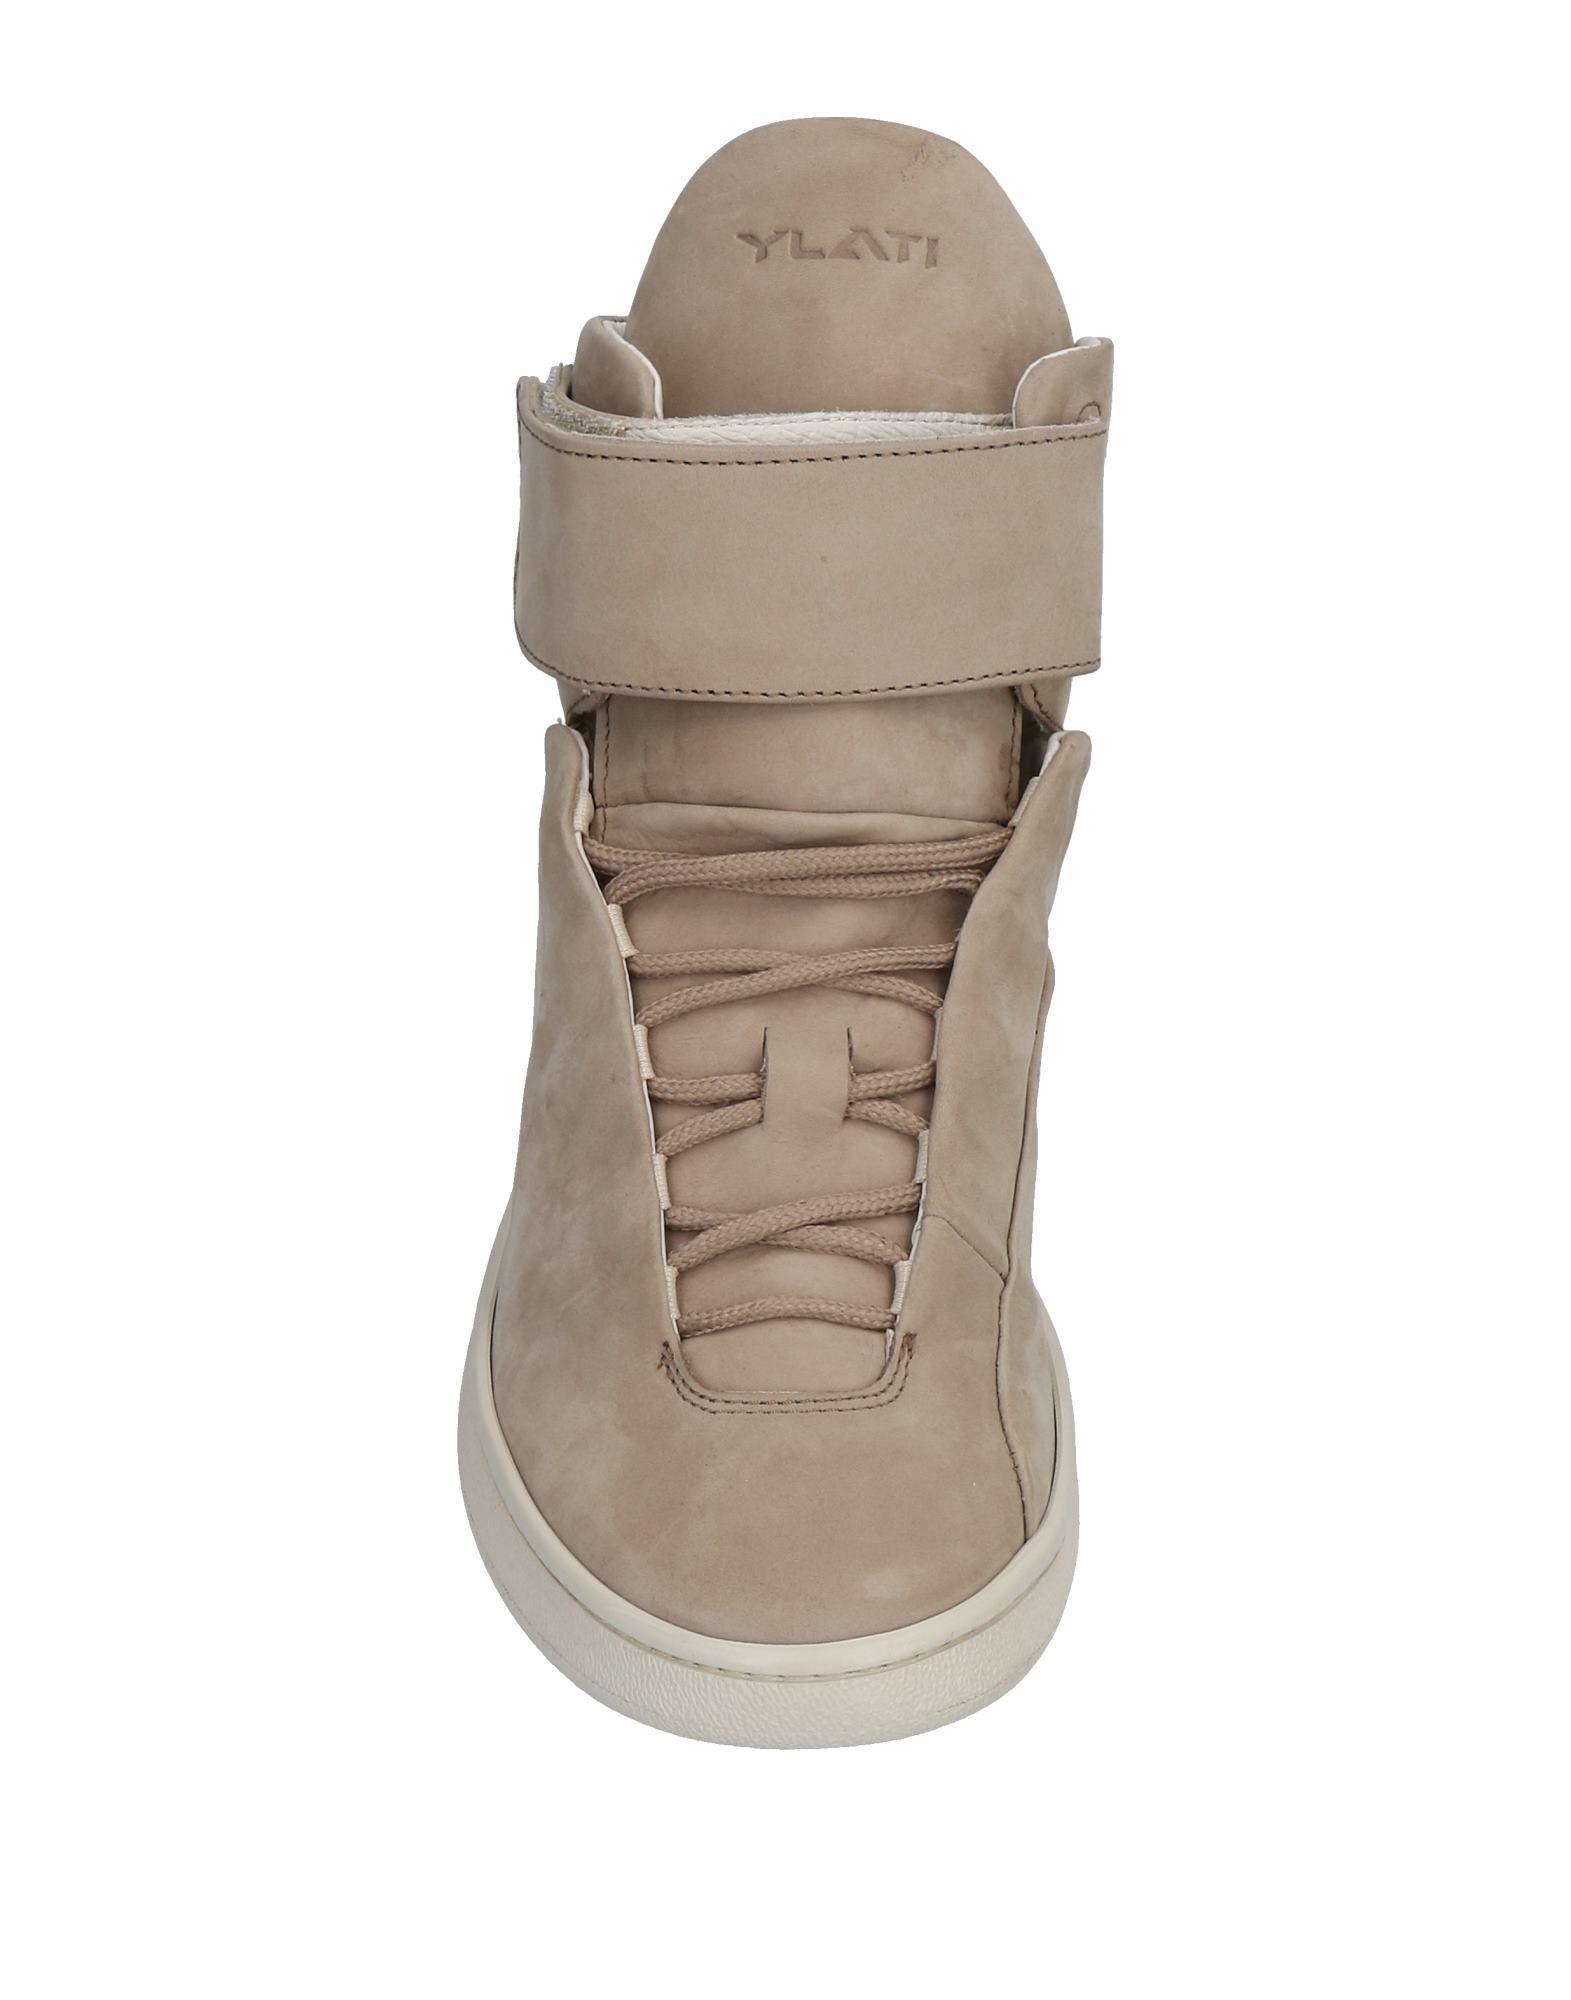 Ylati Ylati  Sneakers Herren  11476187KW d02d54